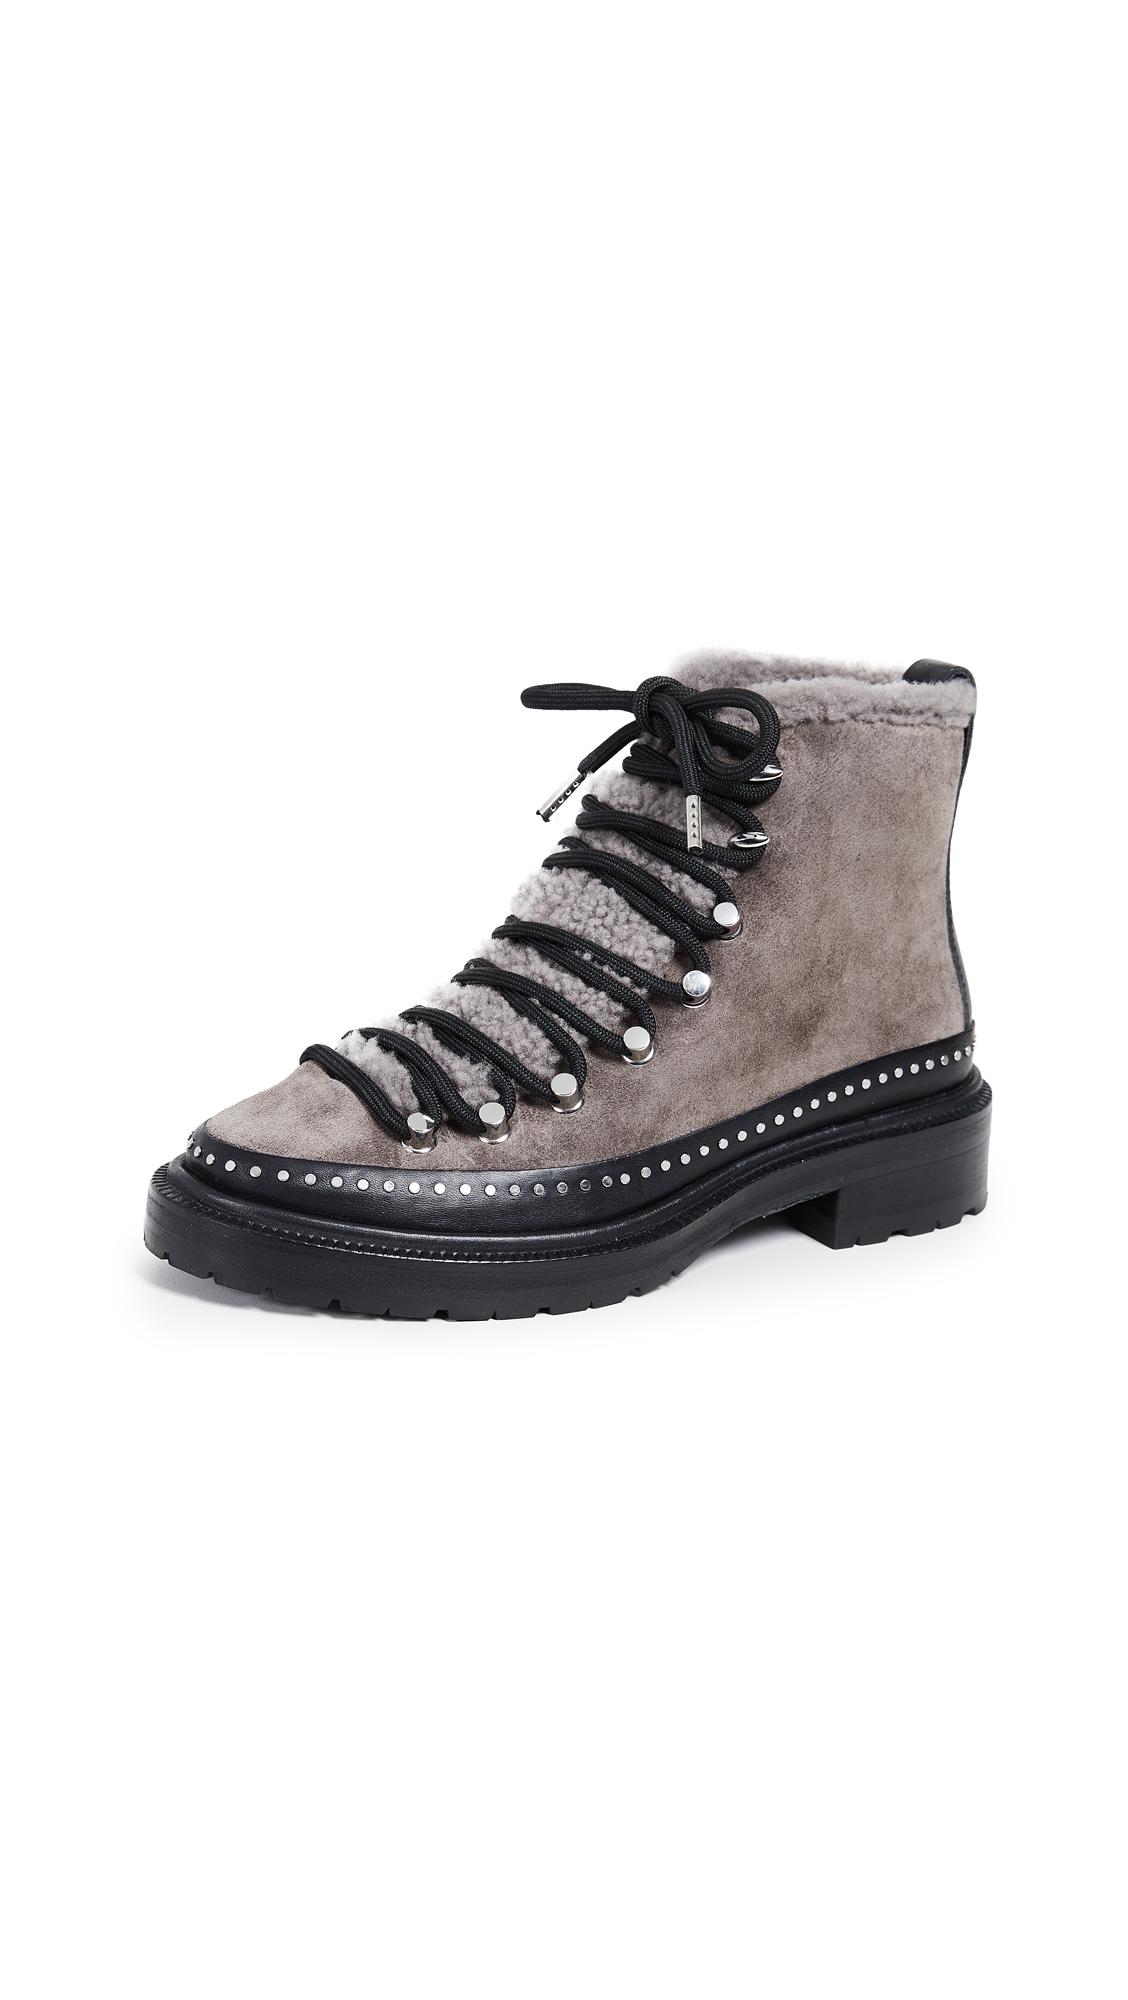 Rag & Bone Compass Boots - Elephant